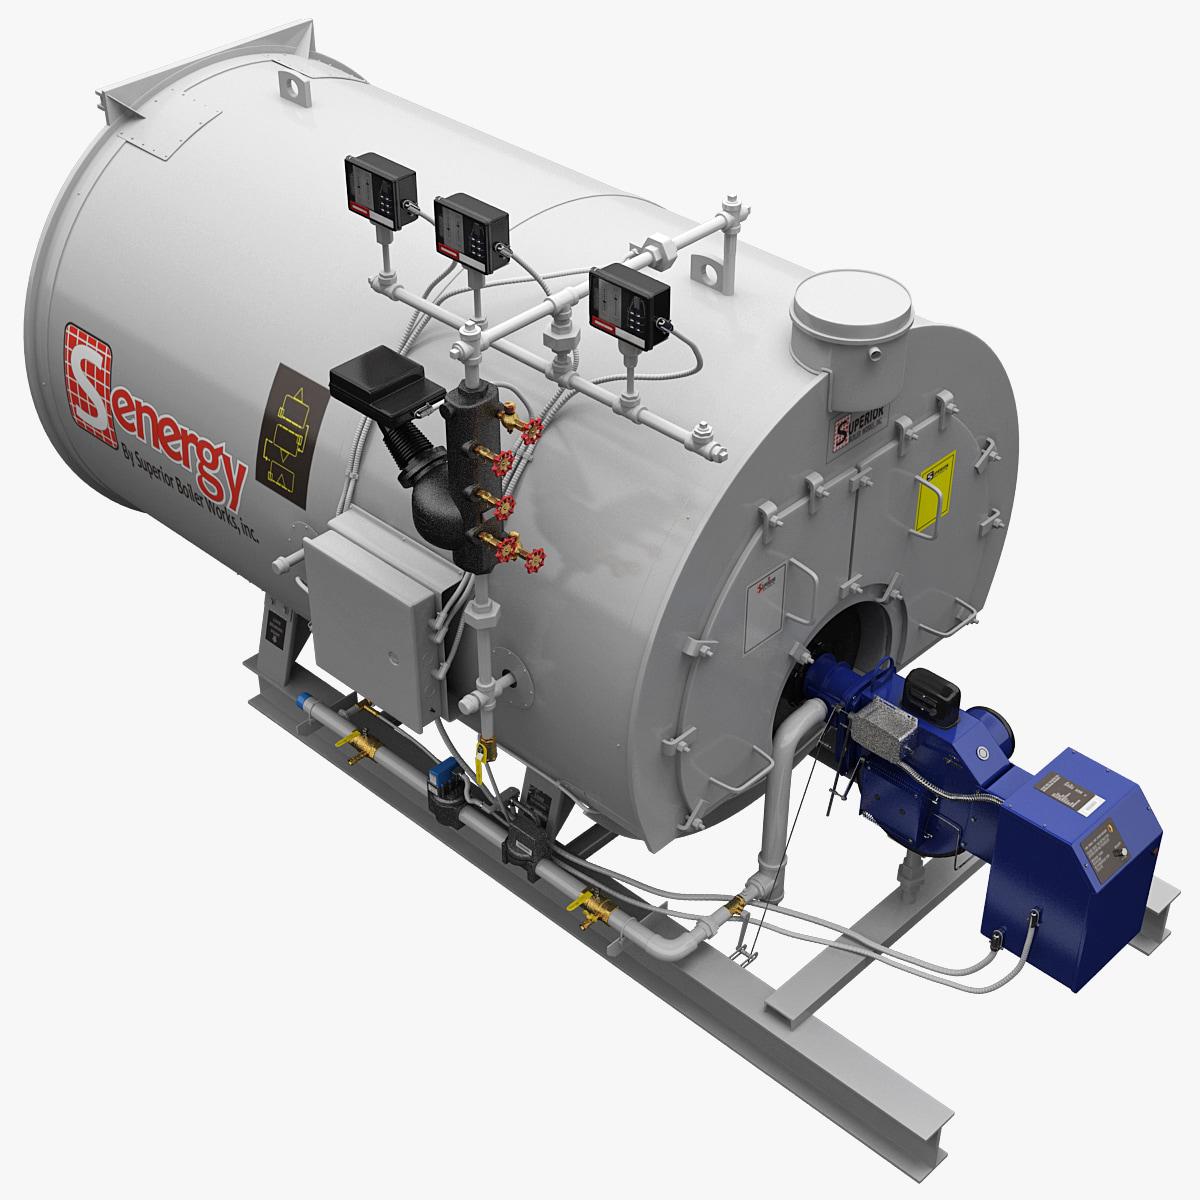 Industrial_Boiler_Senergy_40_HP_0002.jpg